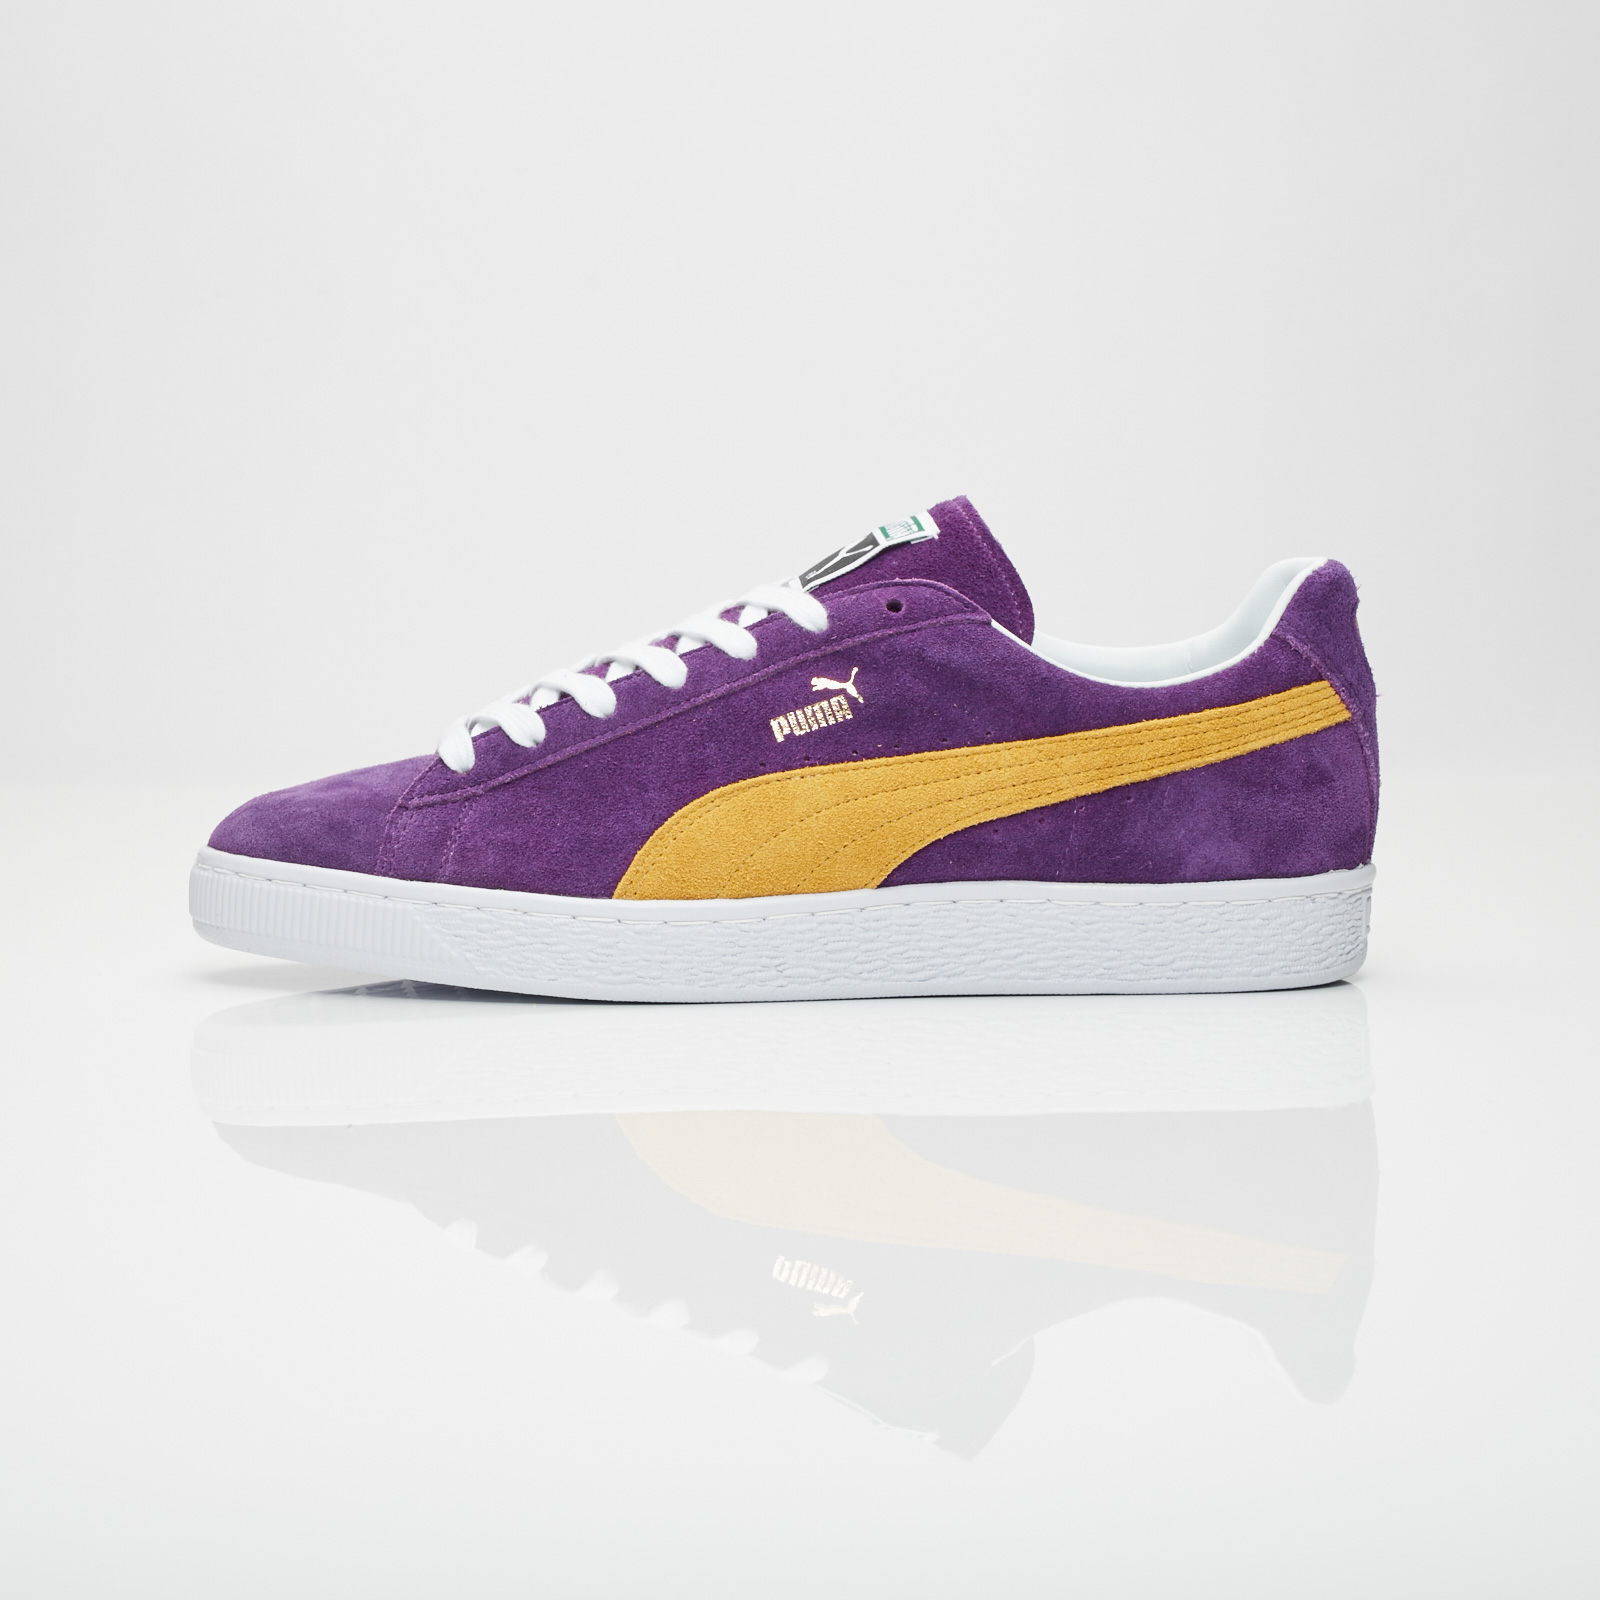 3b9176be18aaa8 Puma Suede Classic X Collectors - 366247-01 - Sneakersnstuff ...